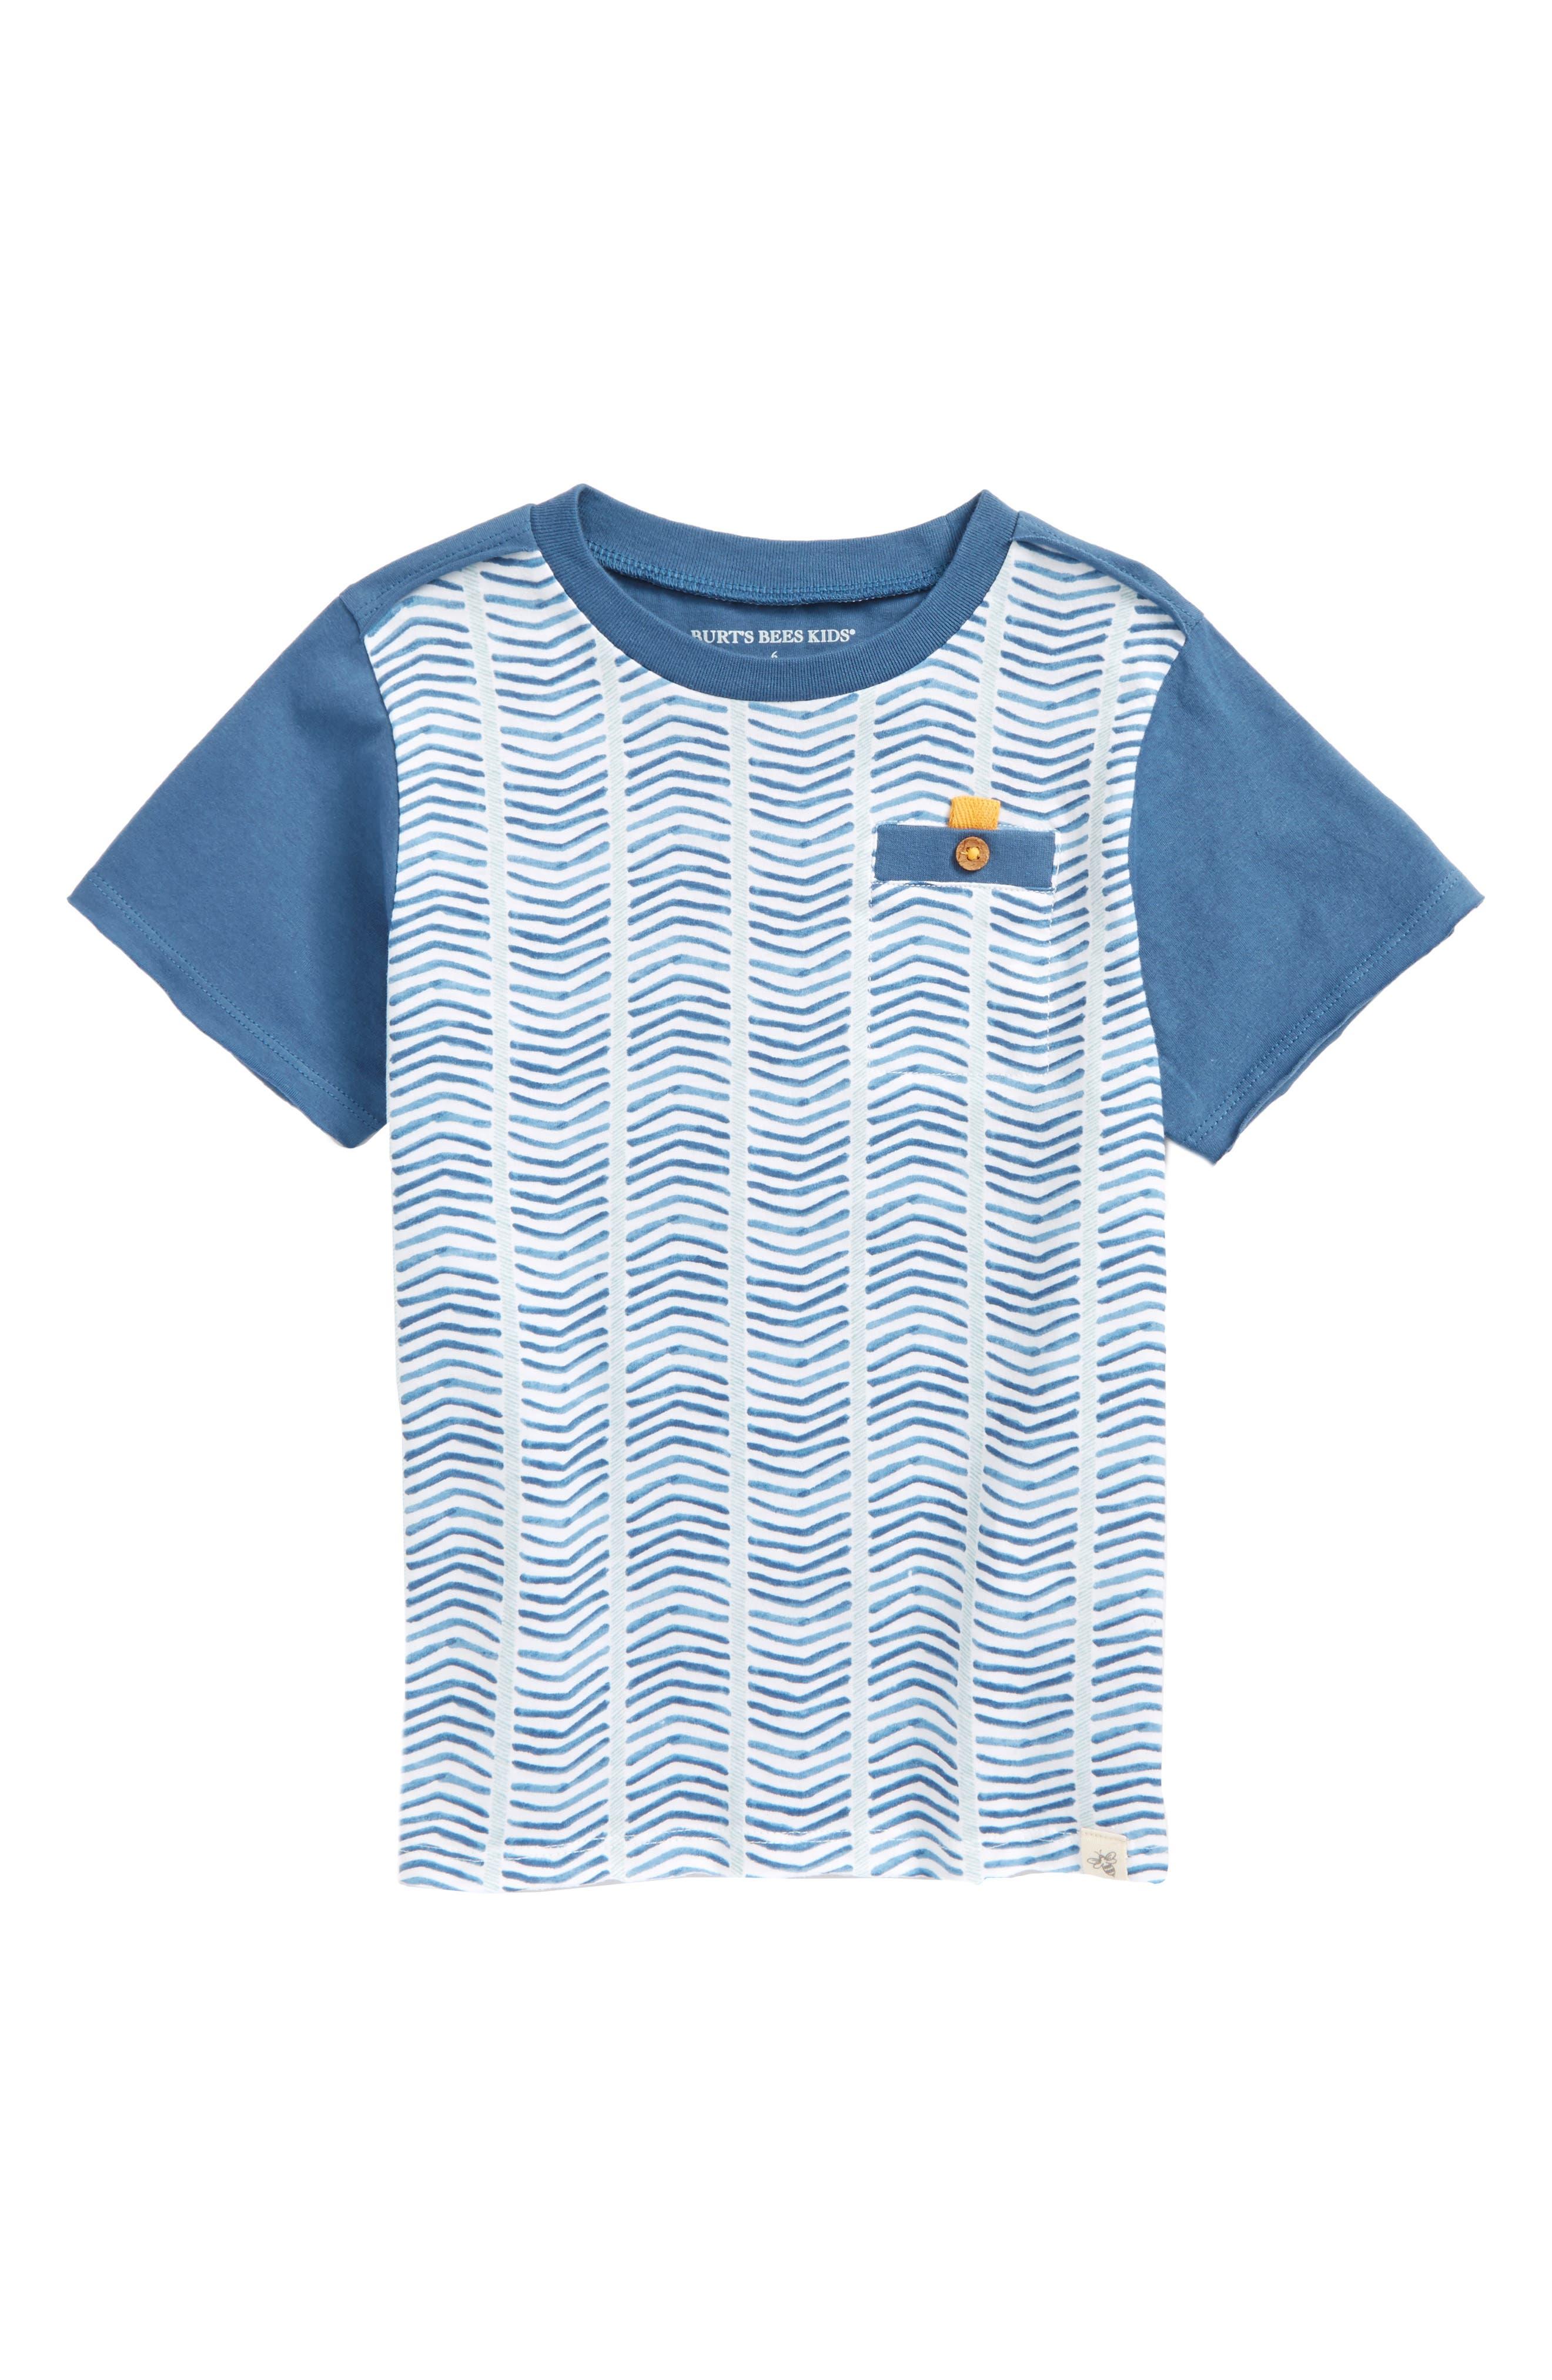 Alternate Image 1 Selected - Burt's Bees Baby Chevron Stripe Organic Cotton T-Shirt (Toddler Boys & Little Boys)